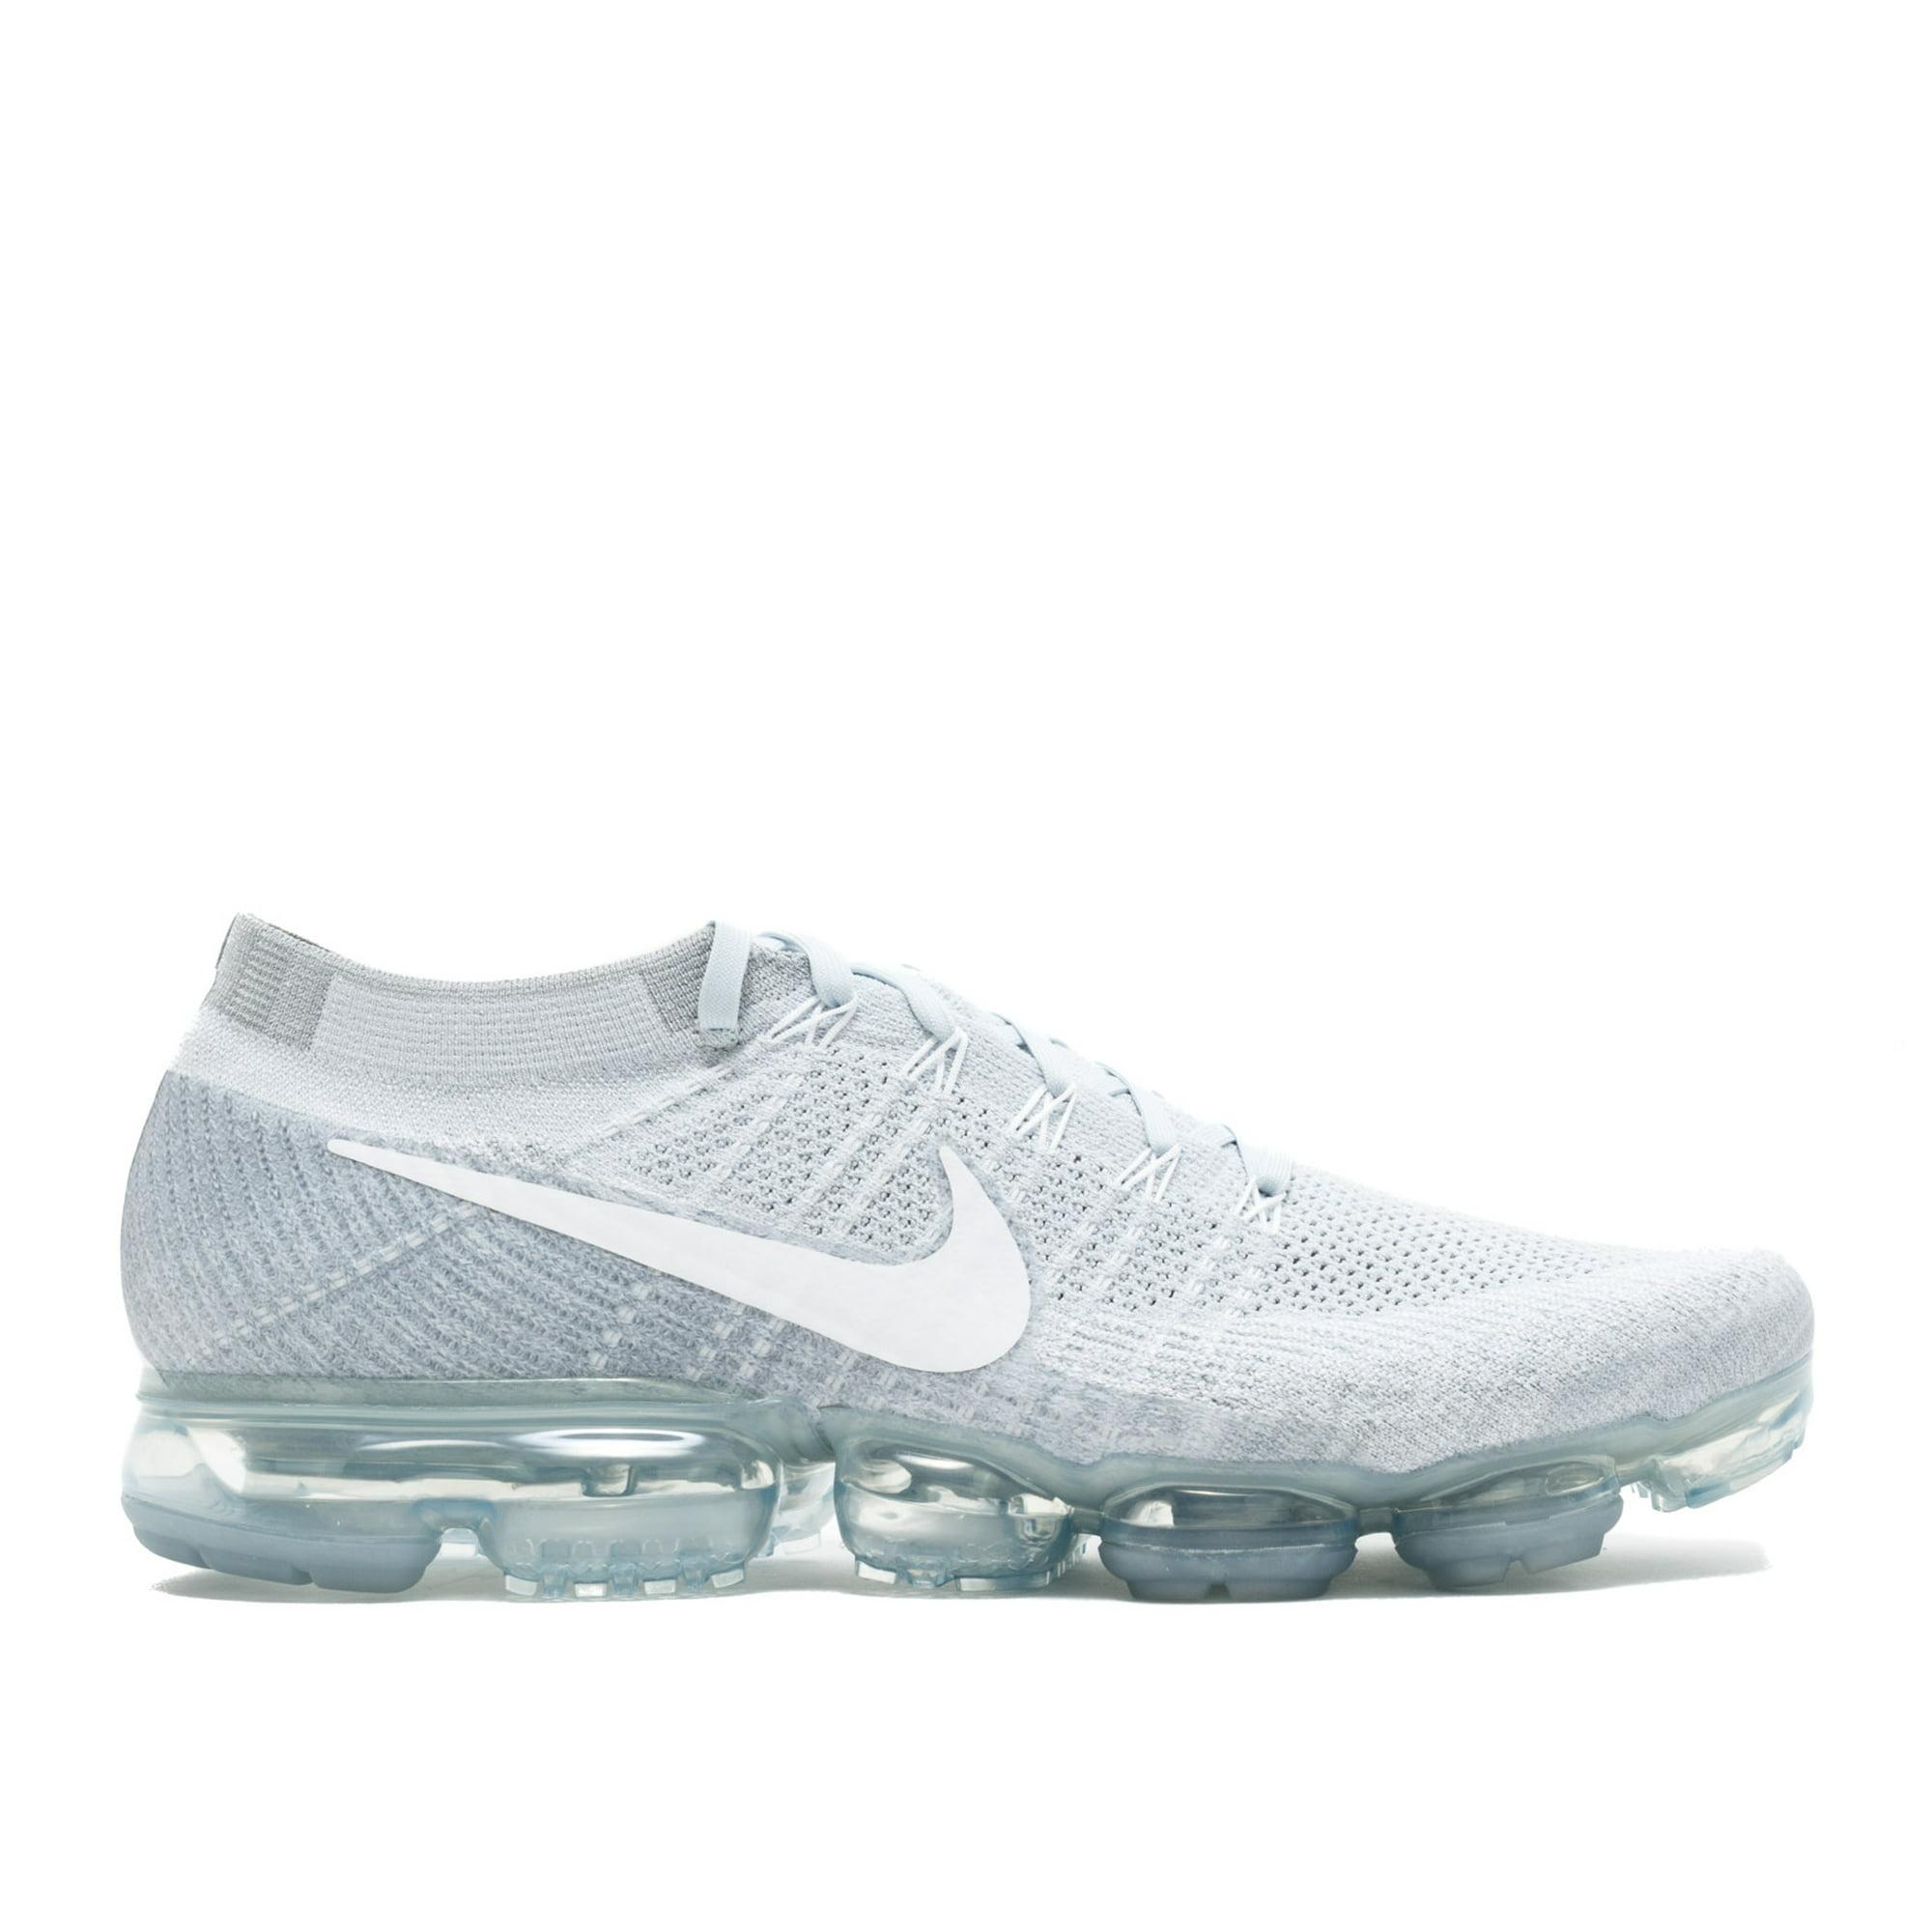 separation shoes 0a66b c99d9 Nike - Men - Nike Air Vapormax Flyknit  Pure Platinum  - 849558-004 - Size  11.5   Walmart Canada